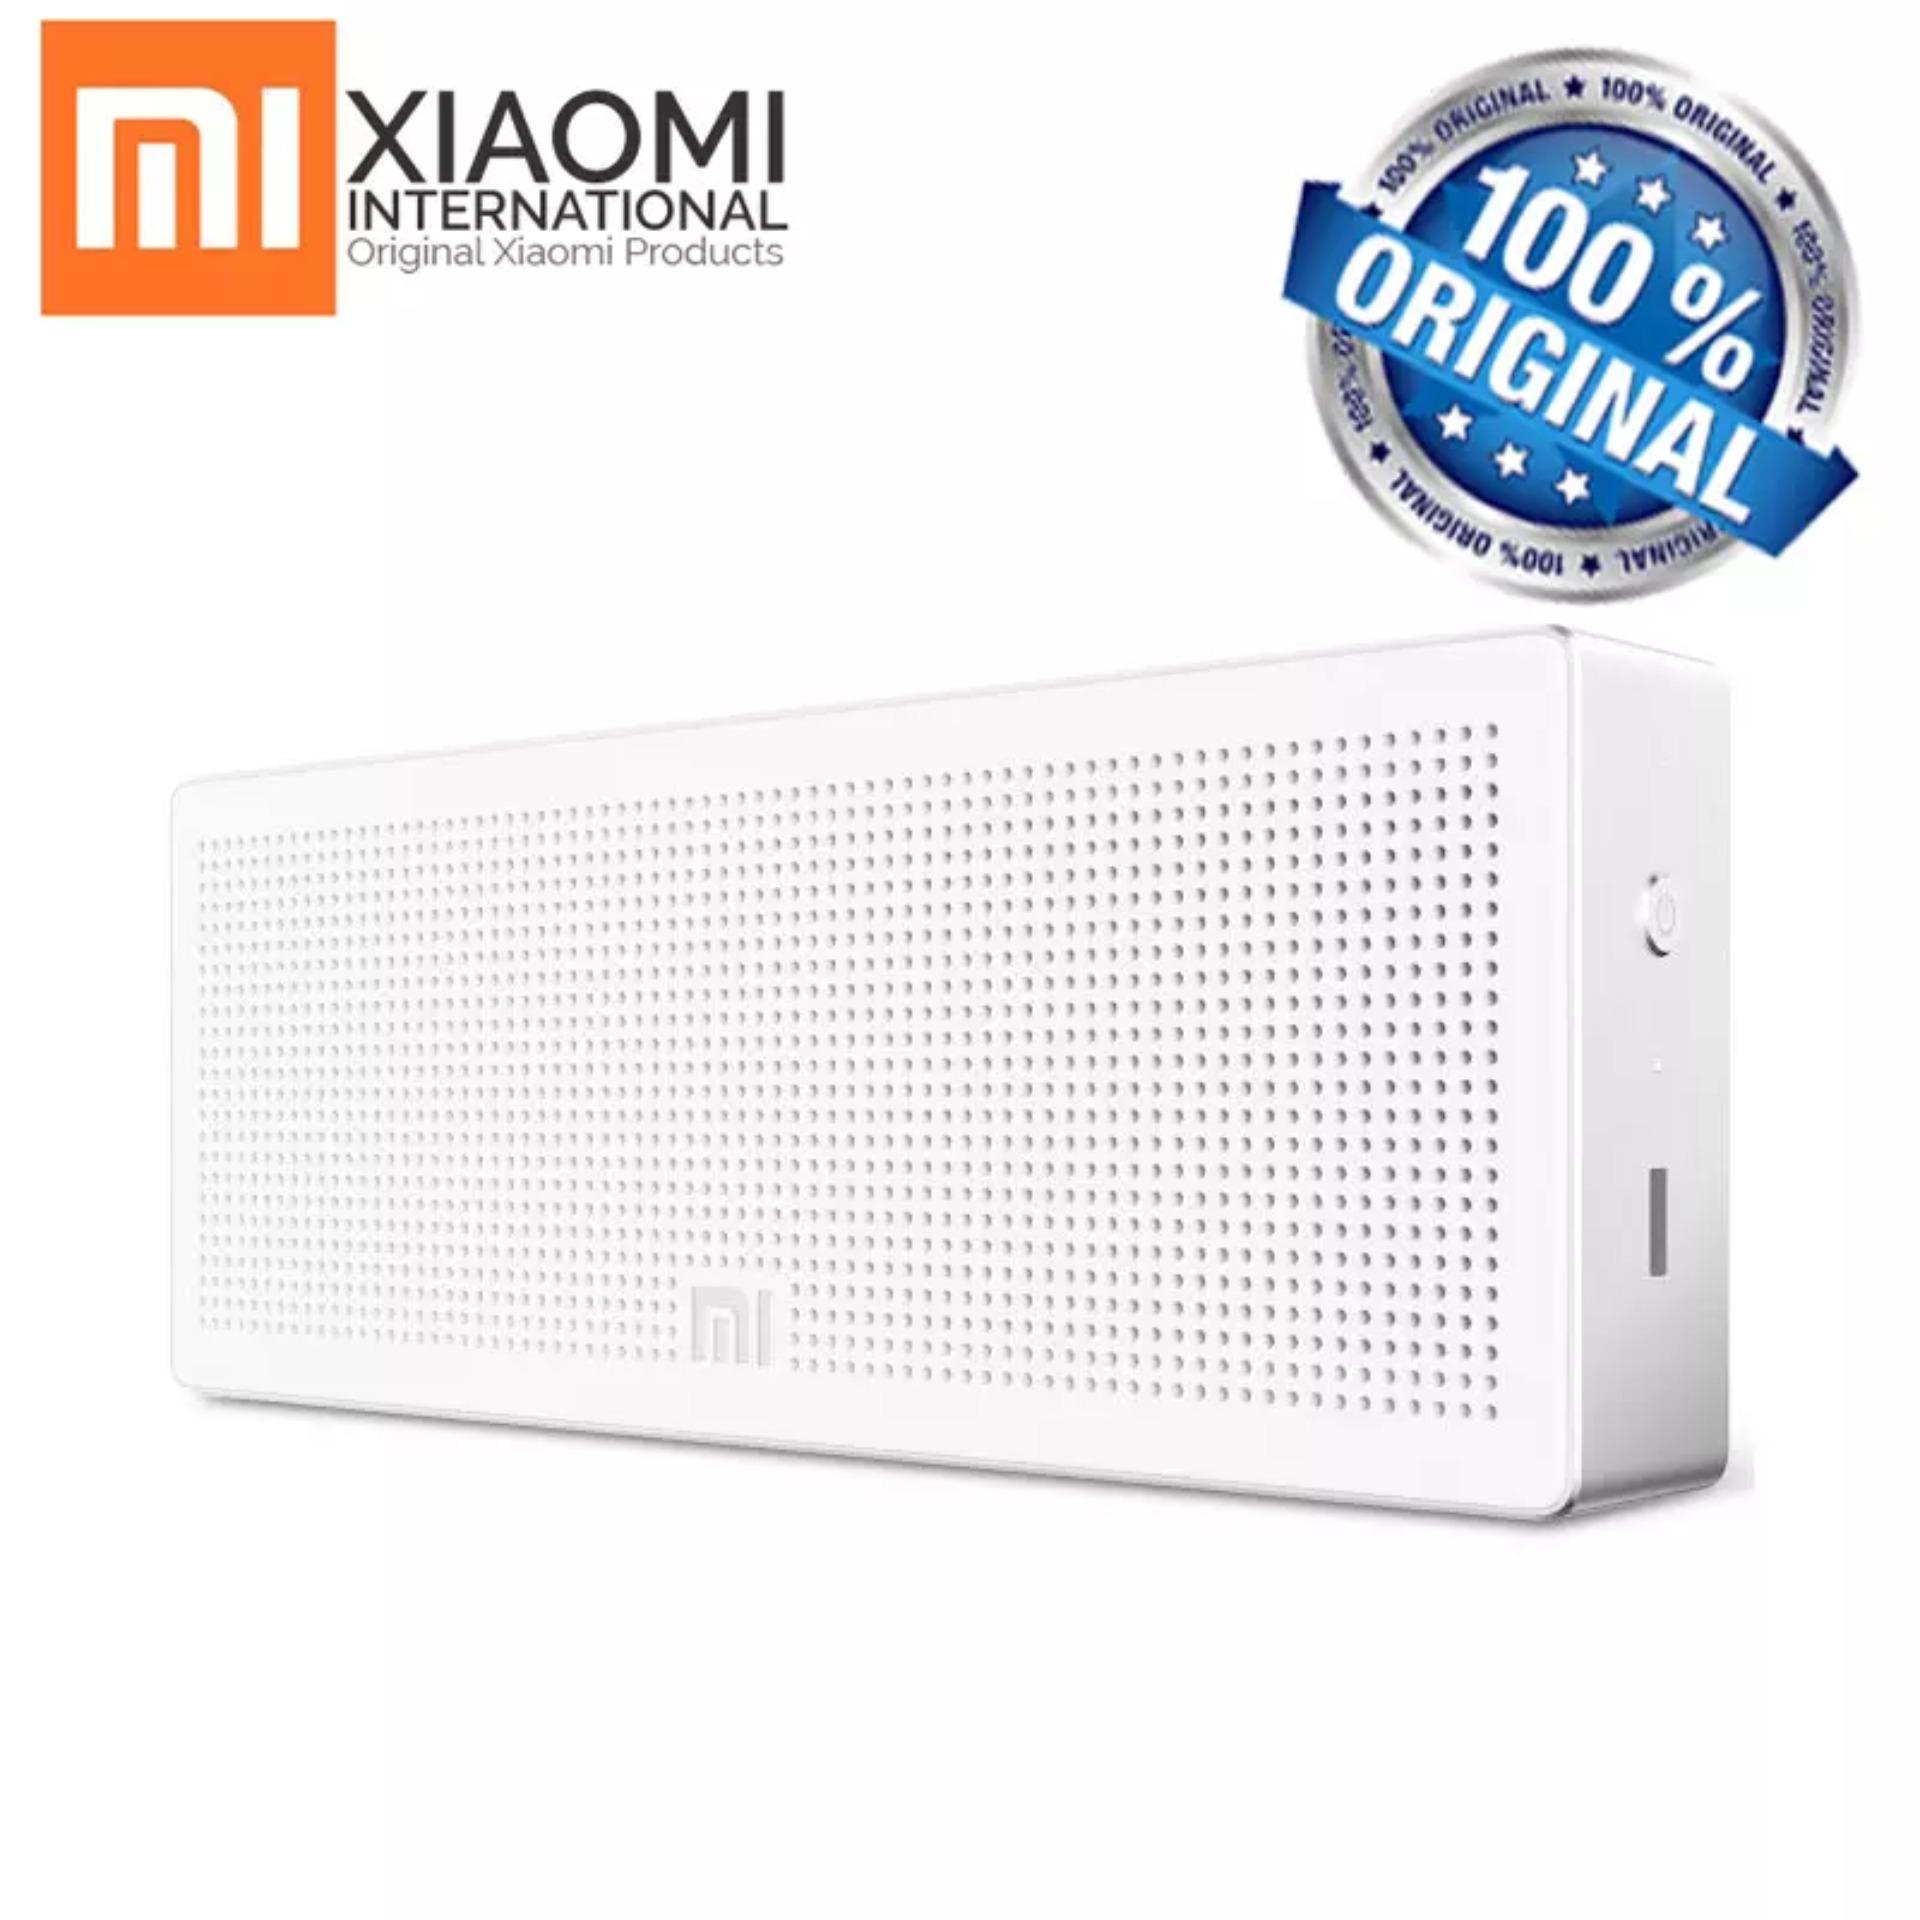 Vivan Speaker Portable Mini Bluetooth With Lamp Putih Daftar Harga Original Xiaomi Mi Square Box Stereo Cubic Cube